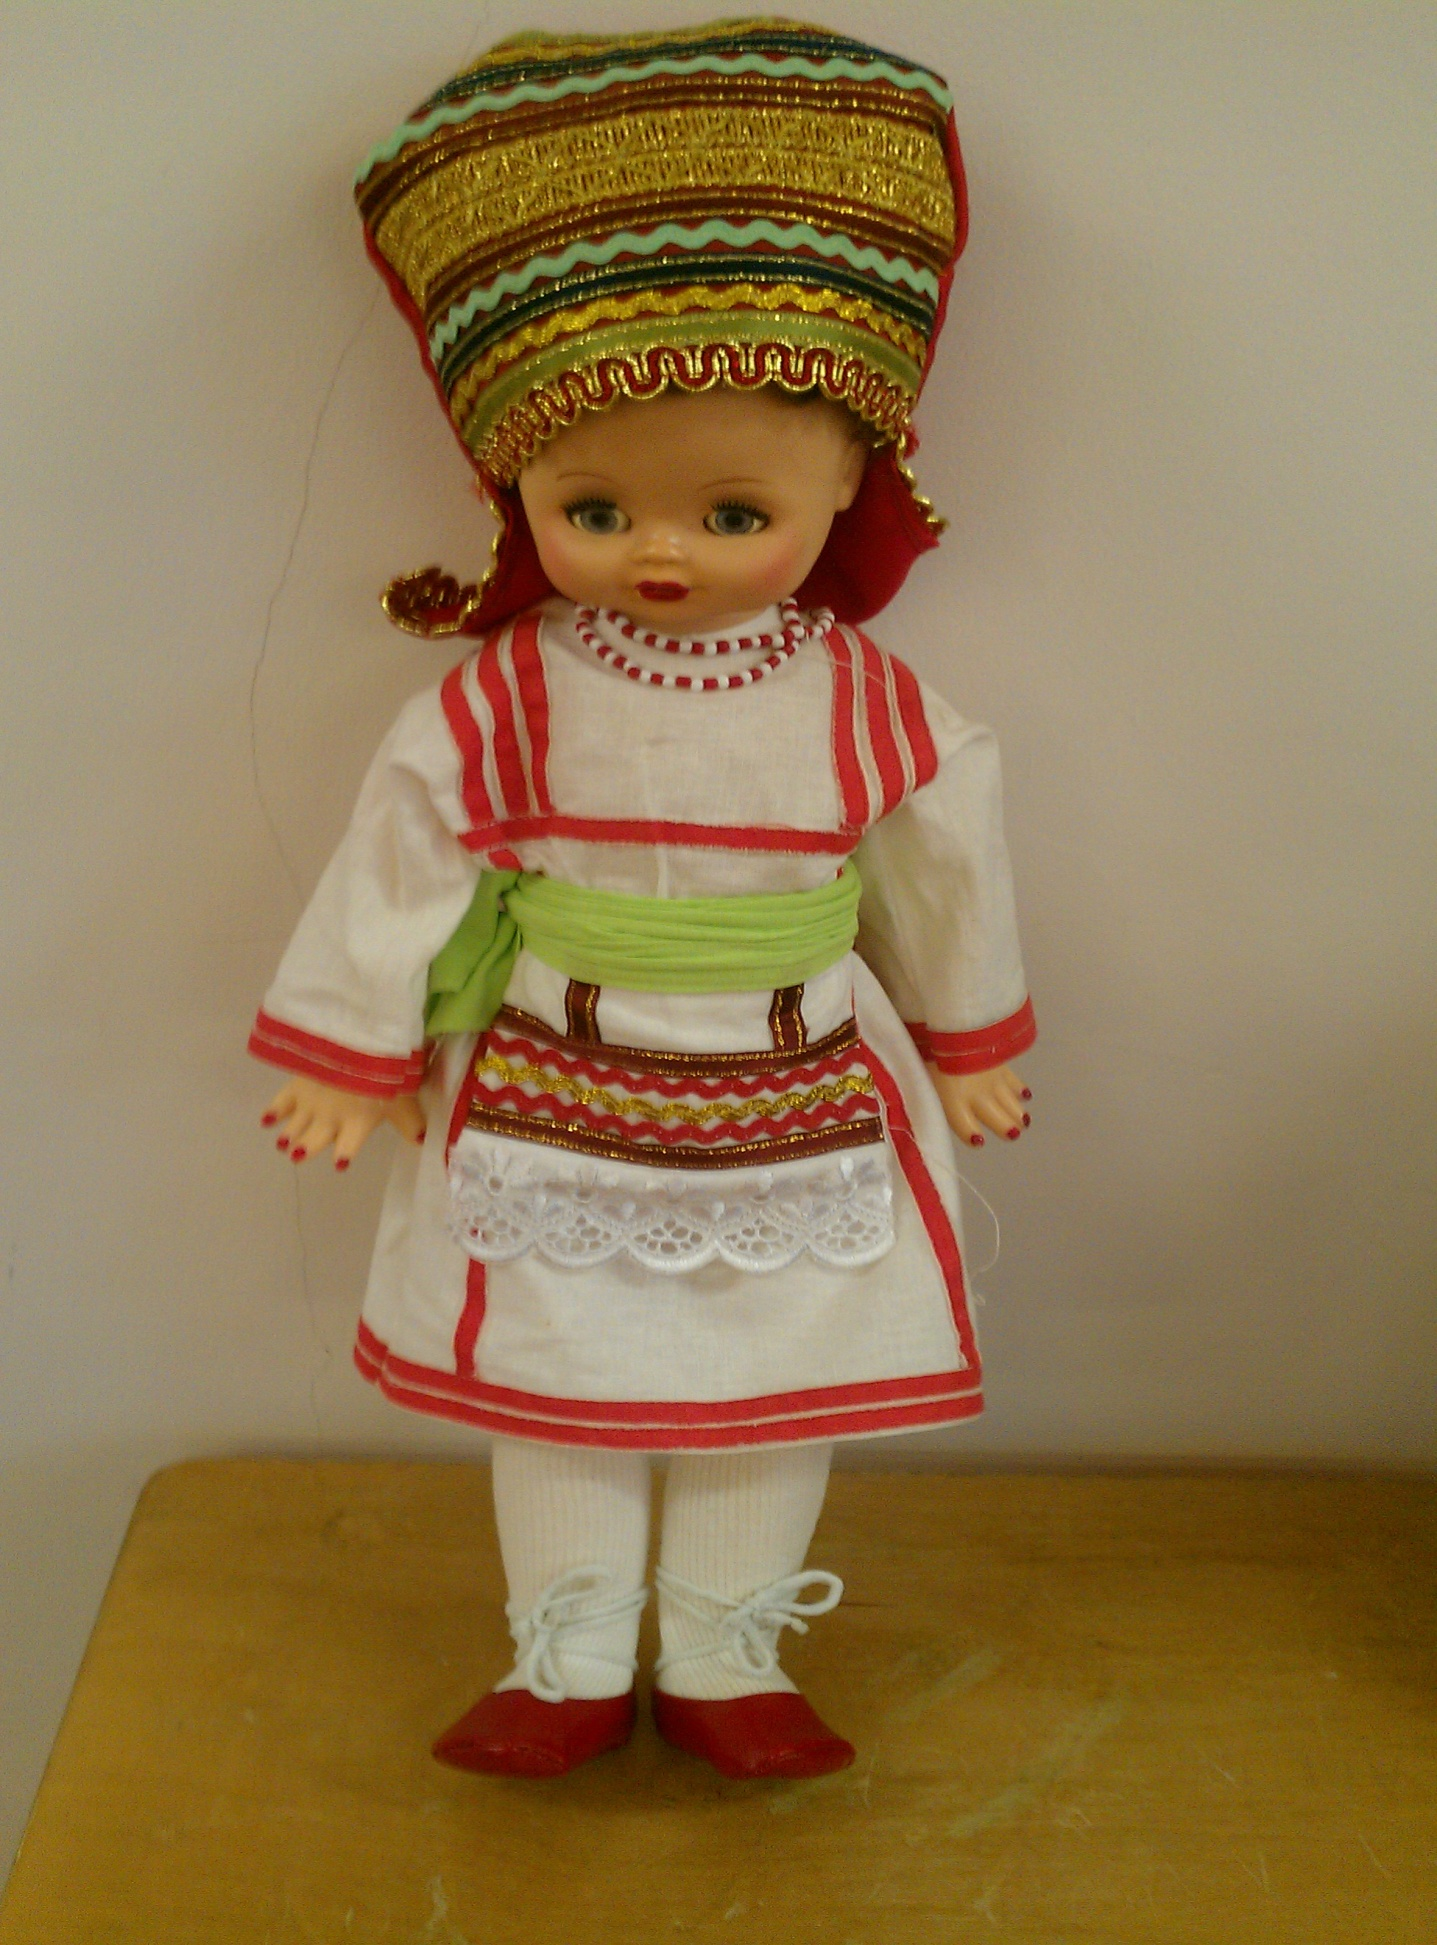 C:\Users\PC\Documents\Моя малая родина 2014\куклы\IMAG2617.jpg